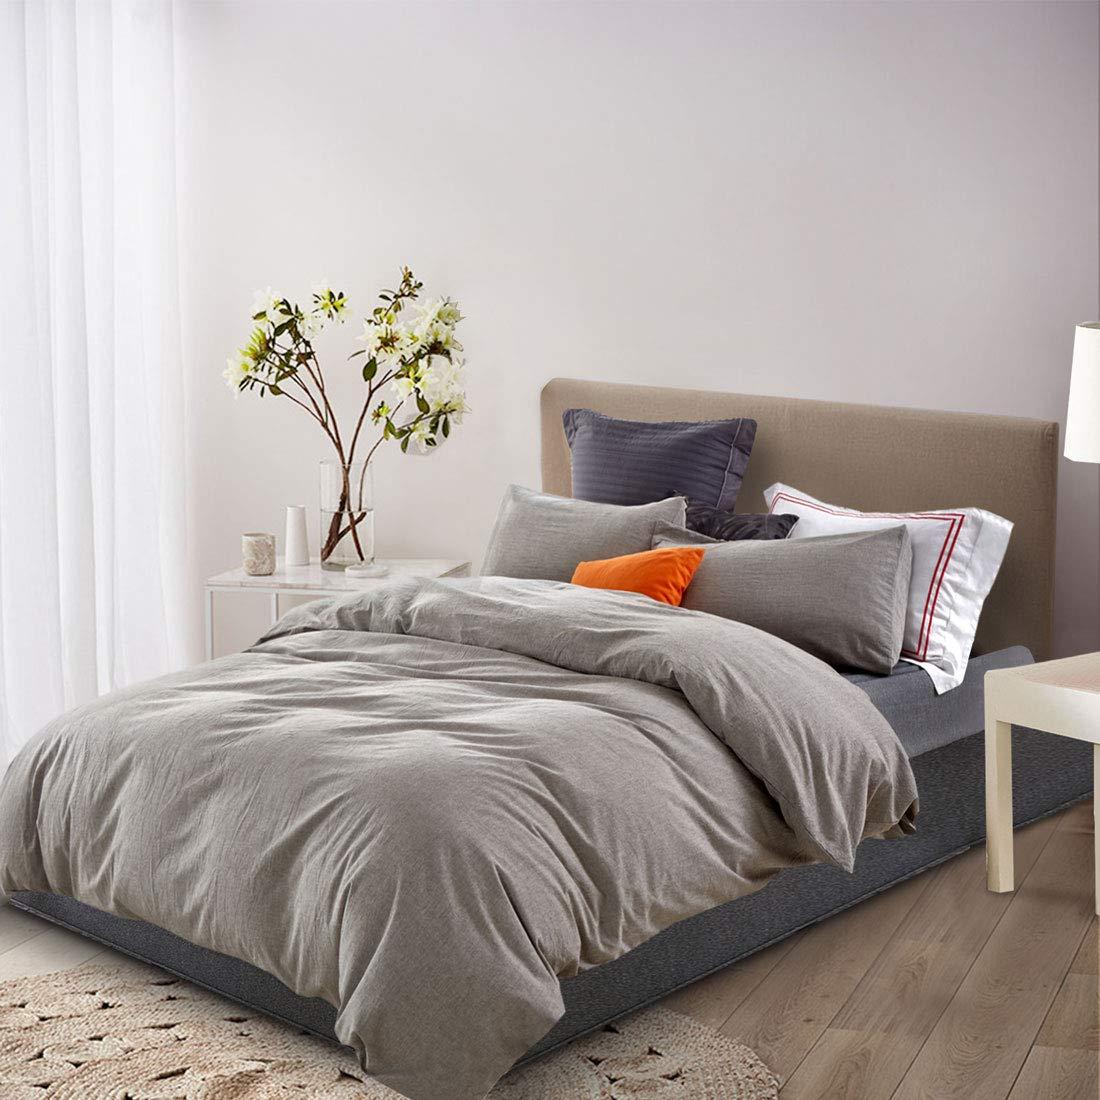 ATsense Duvet Cover Sets, 100% Washed Cotton, Queen 3-Piece Bedding Duvet Cover, Simple Style Farmhouse Bedding Set (Grey 7063) by ATsense (Image #2)